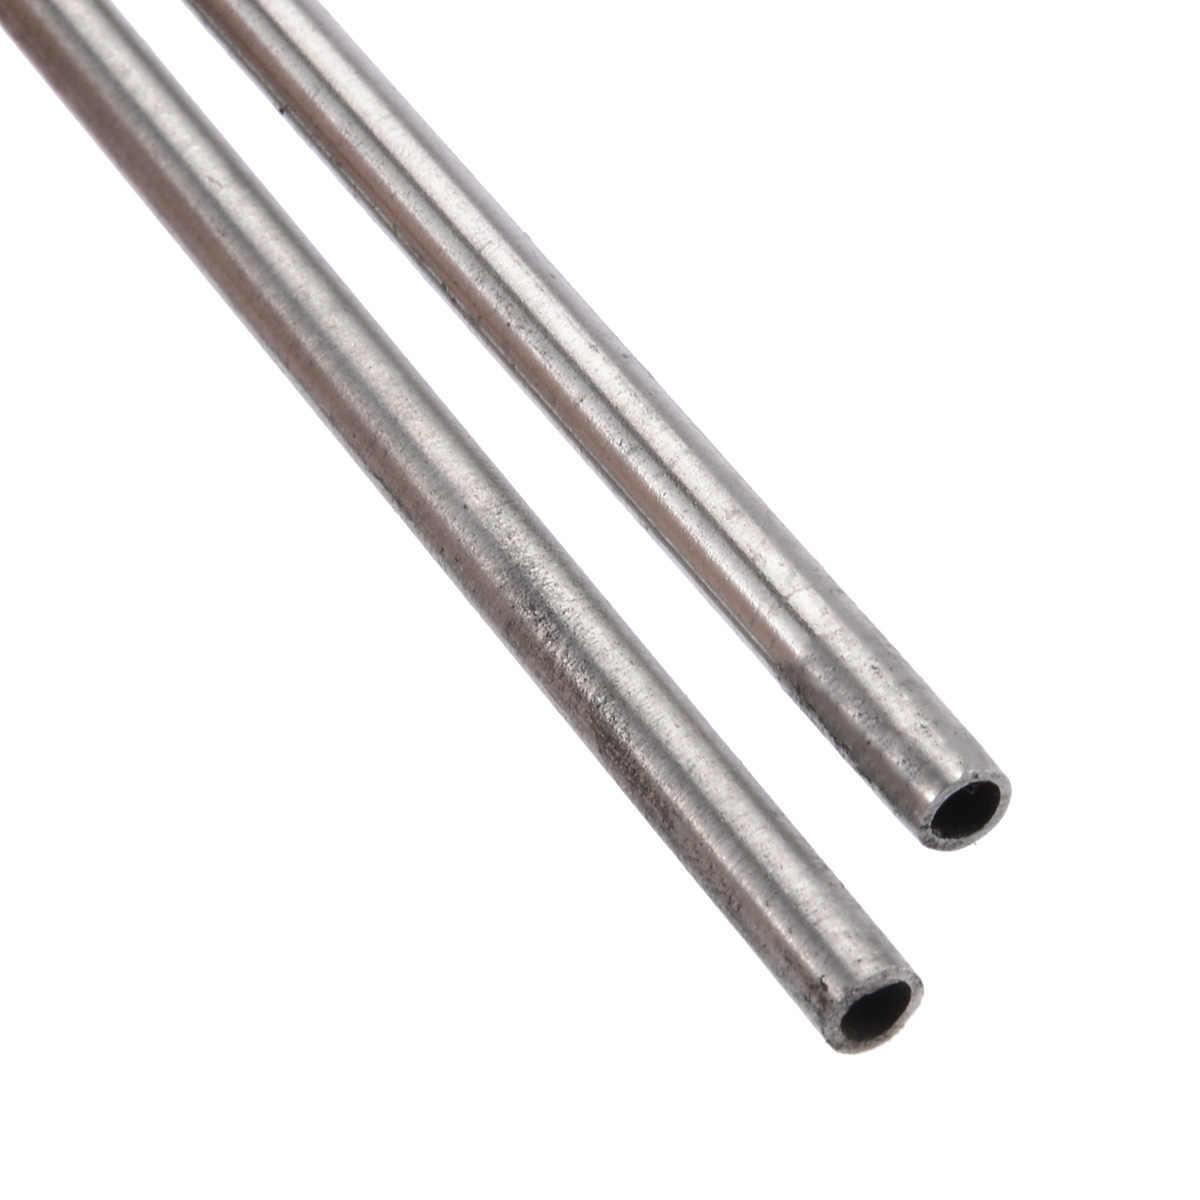 304 Stainless steel capillary tube OD 4mm x 2mm ID length 250mm metal t~DJJUS